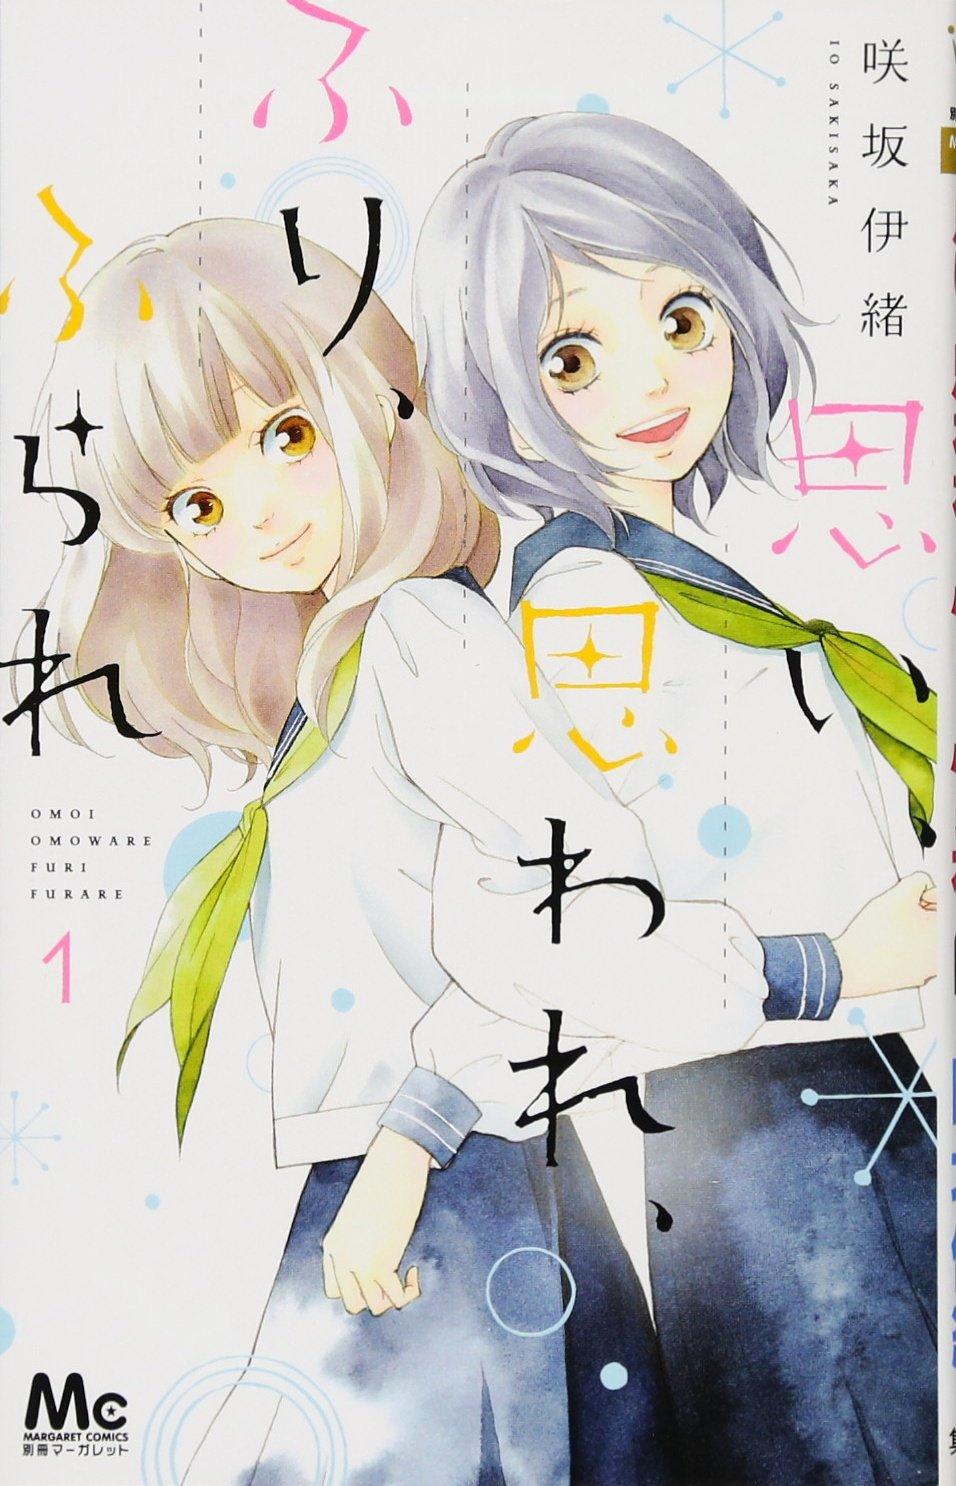 Manga Omoi, Omoware, Furi, Furare é anunciado pela Panini